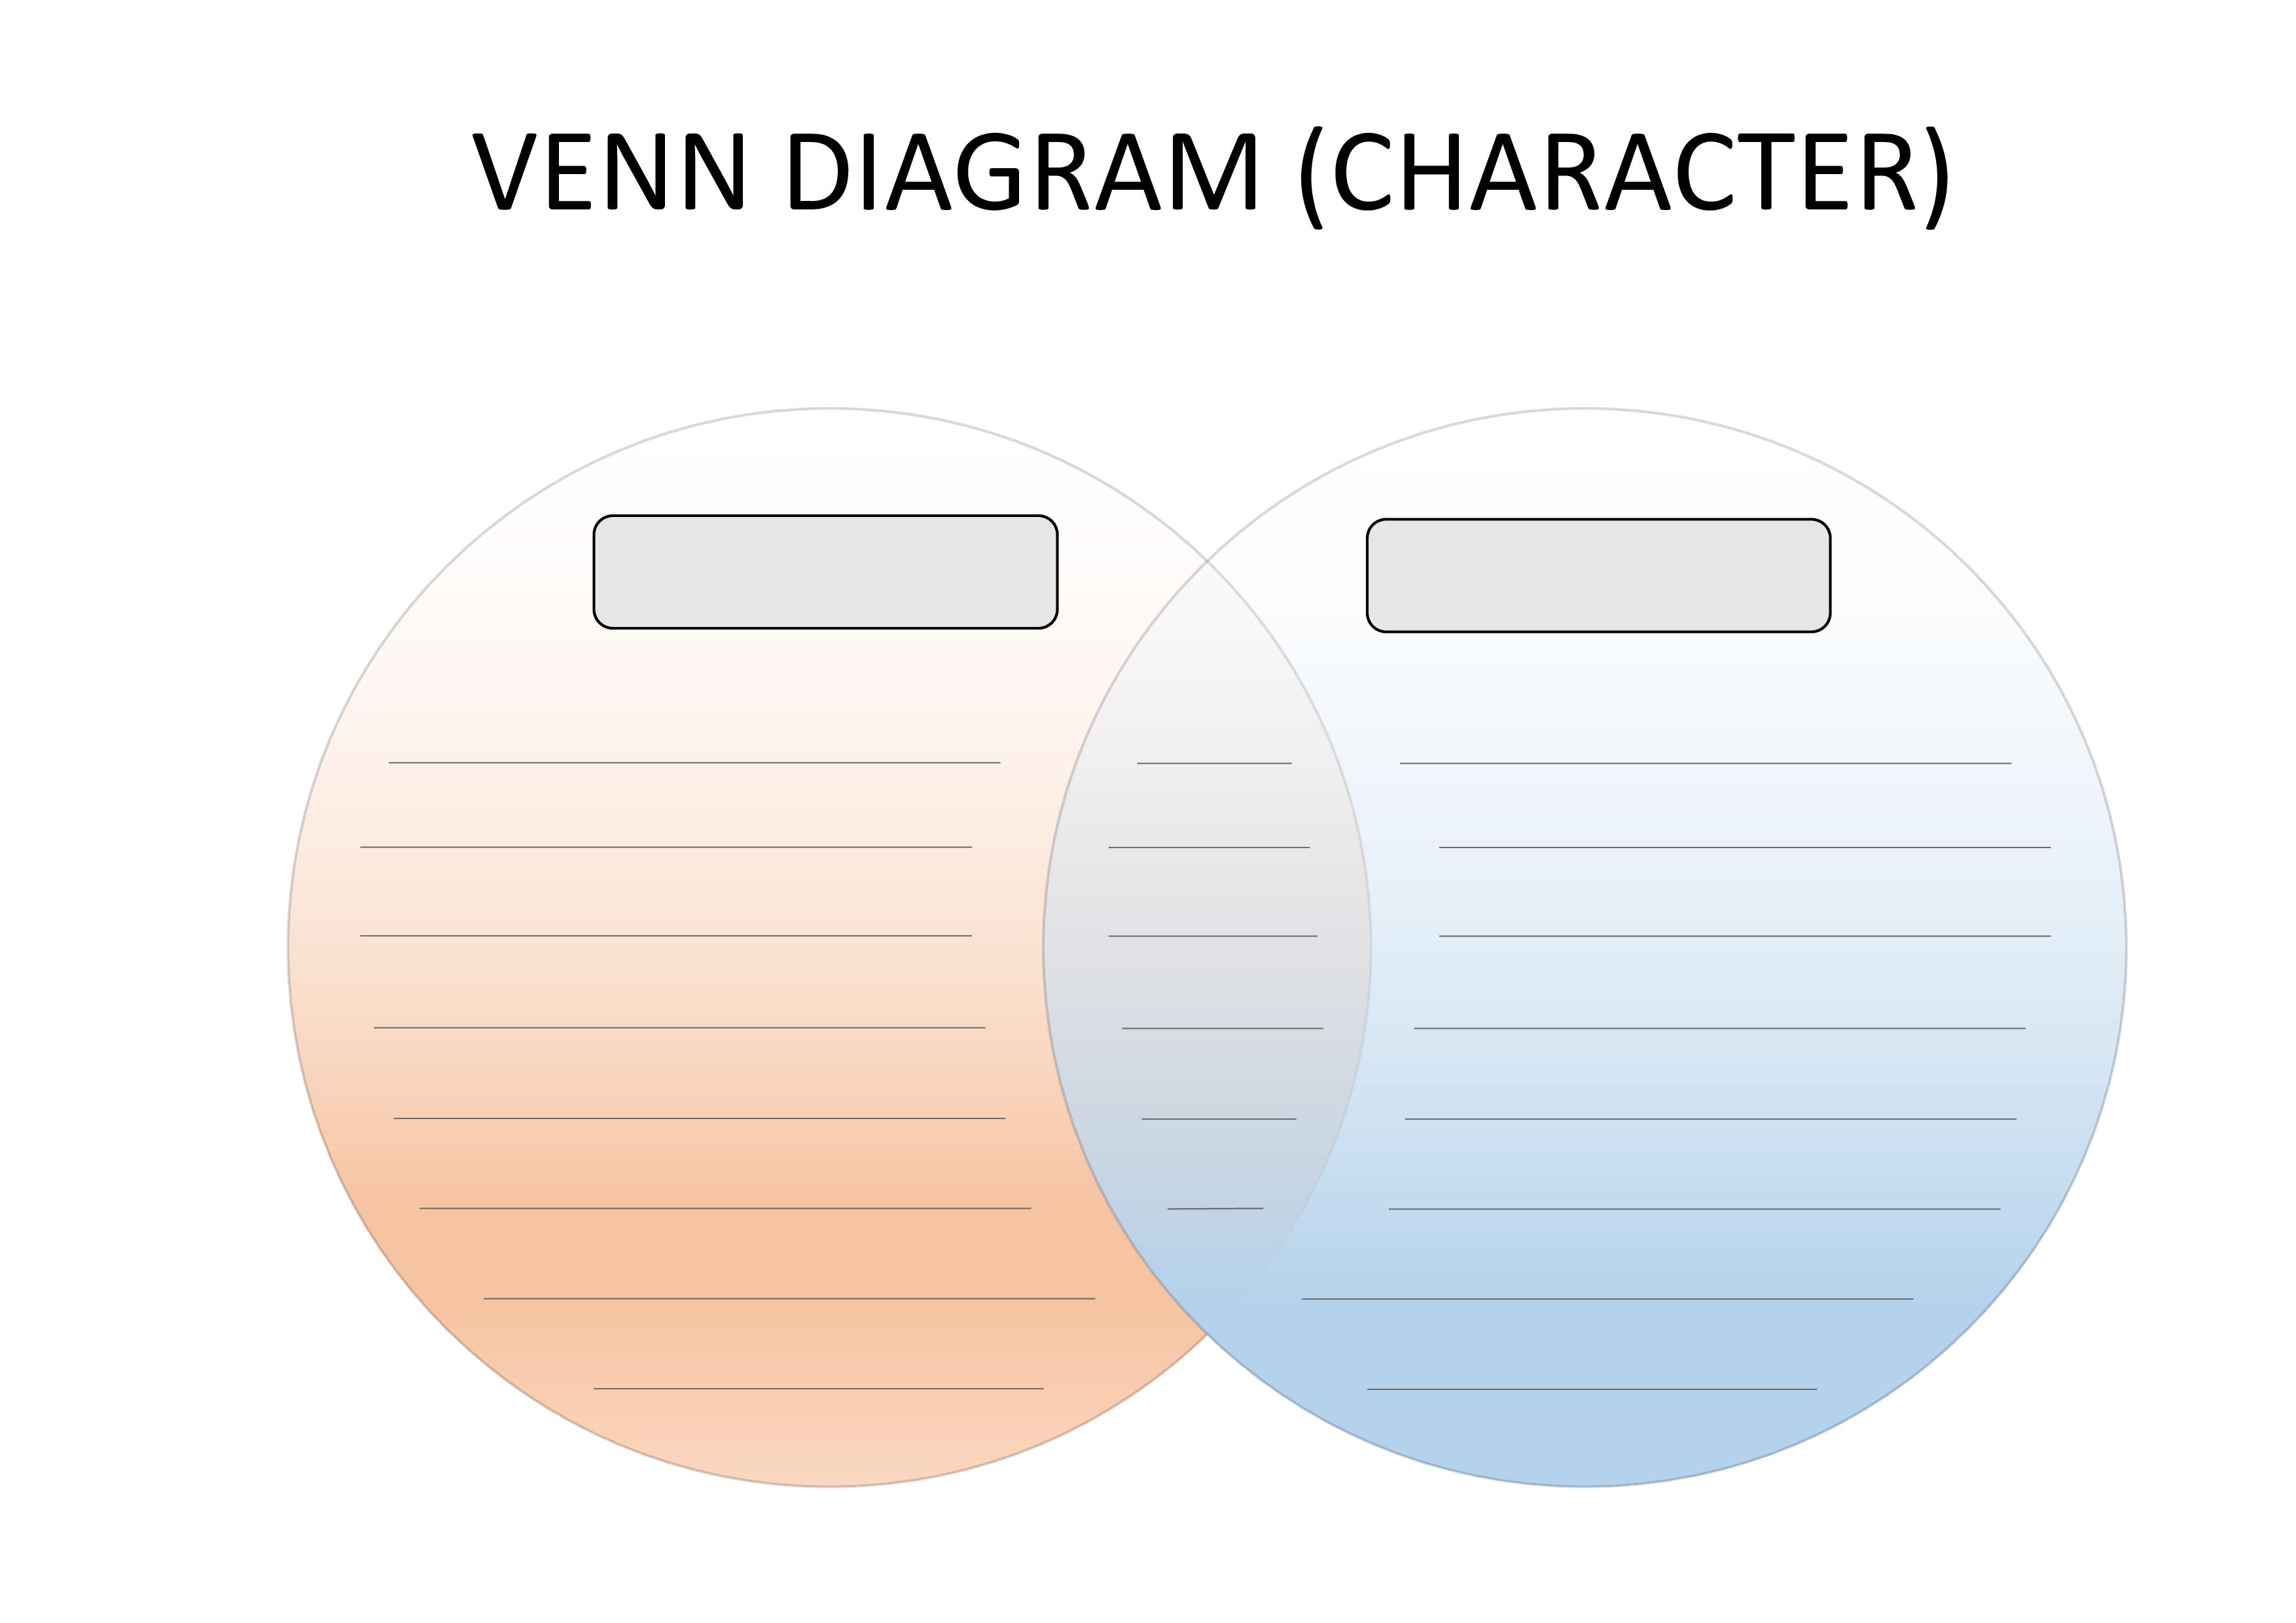 Venn Diagram Template Gratis Colored Venn Diagram Template